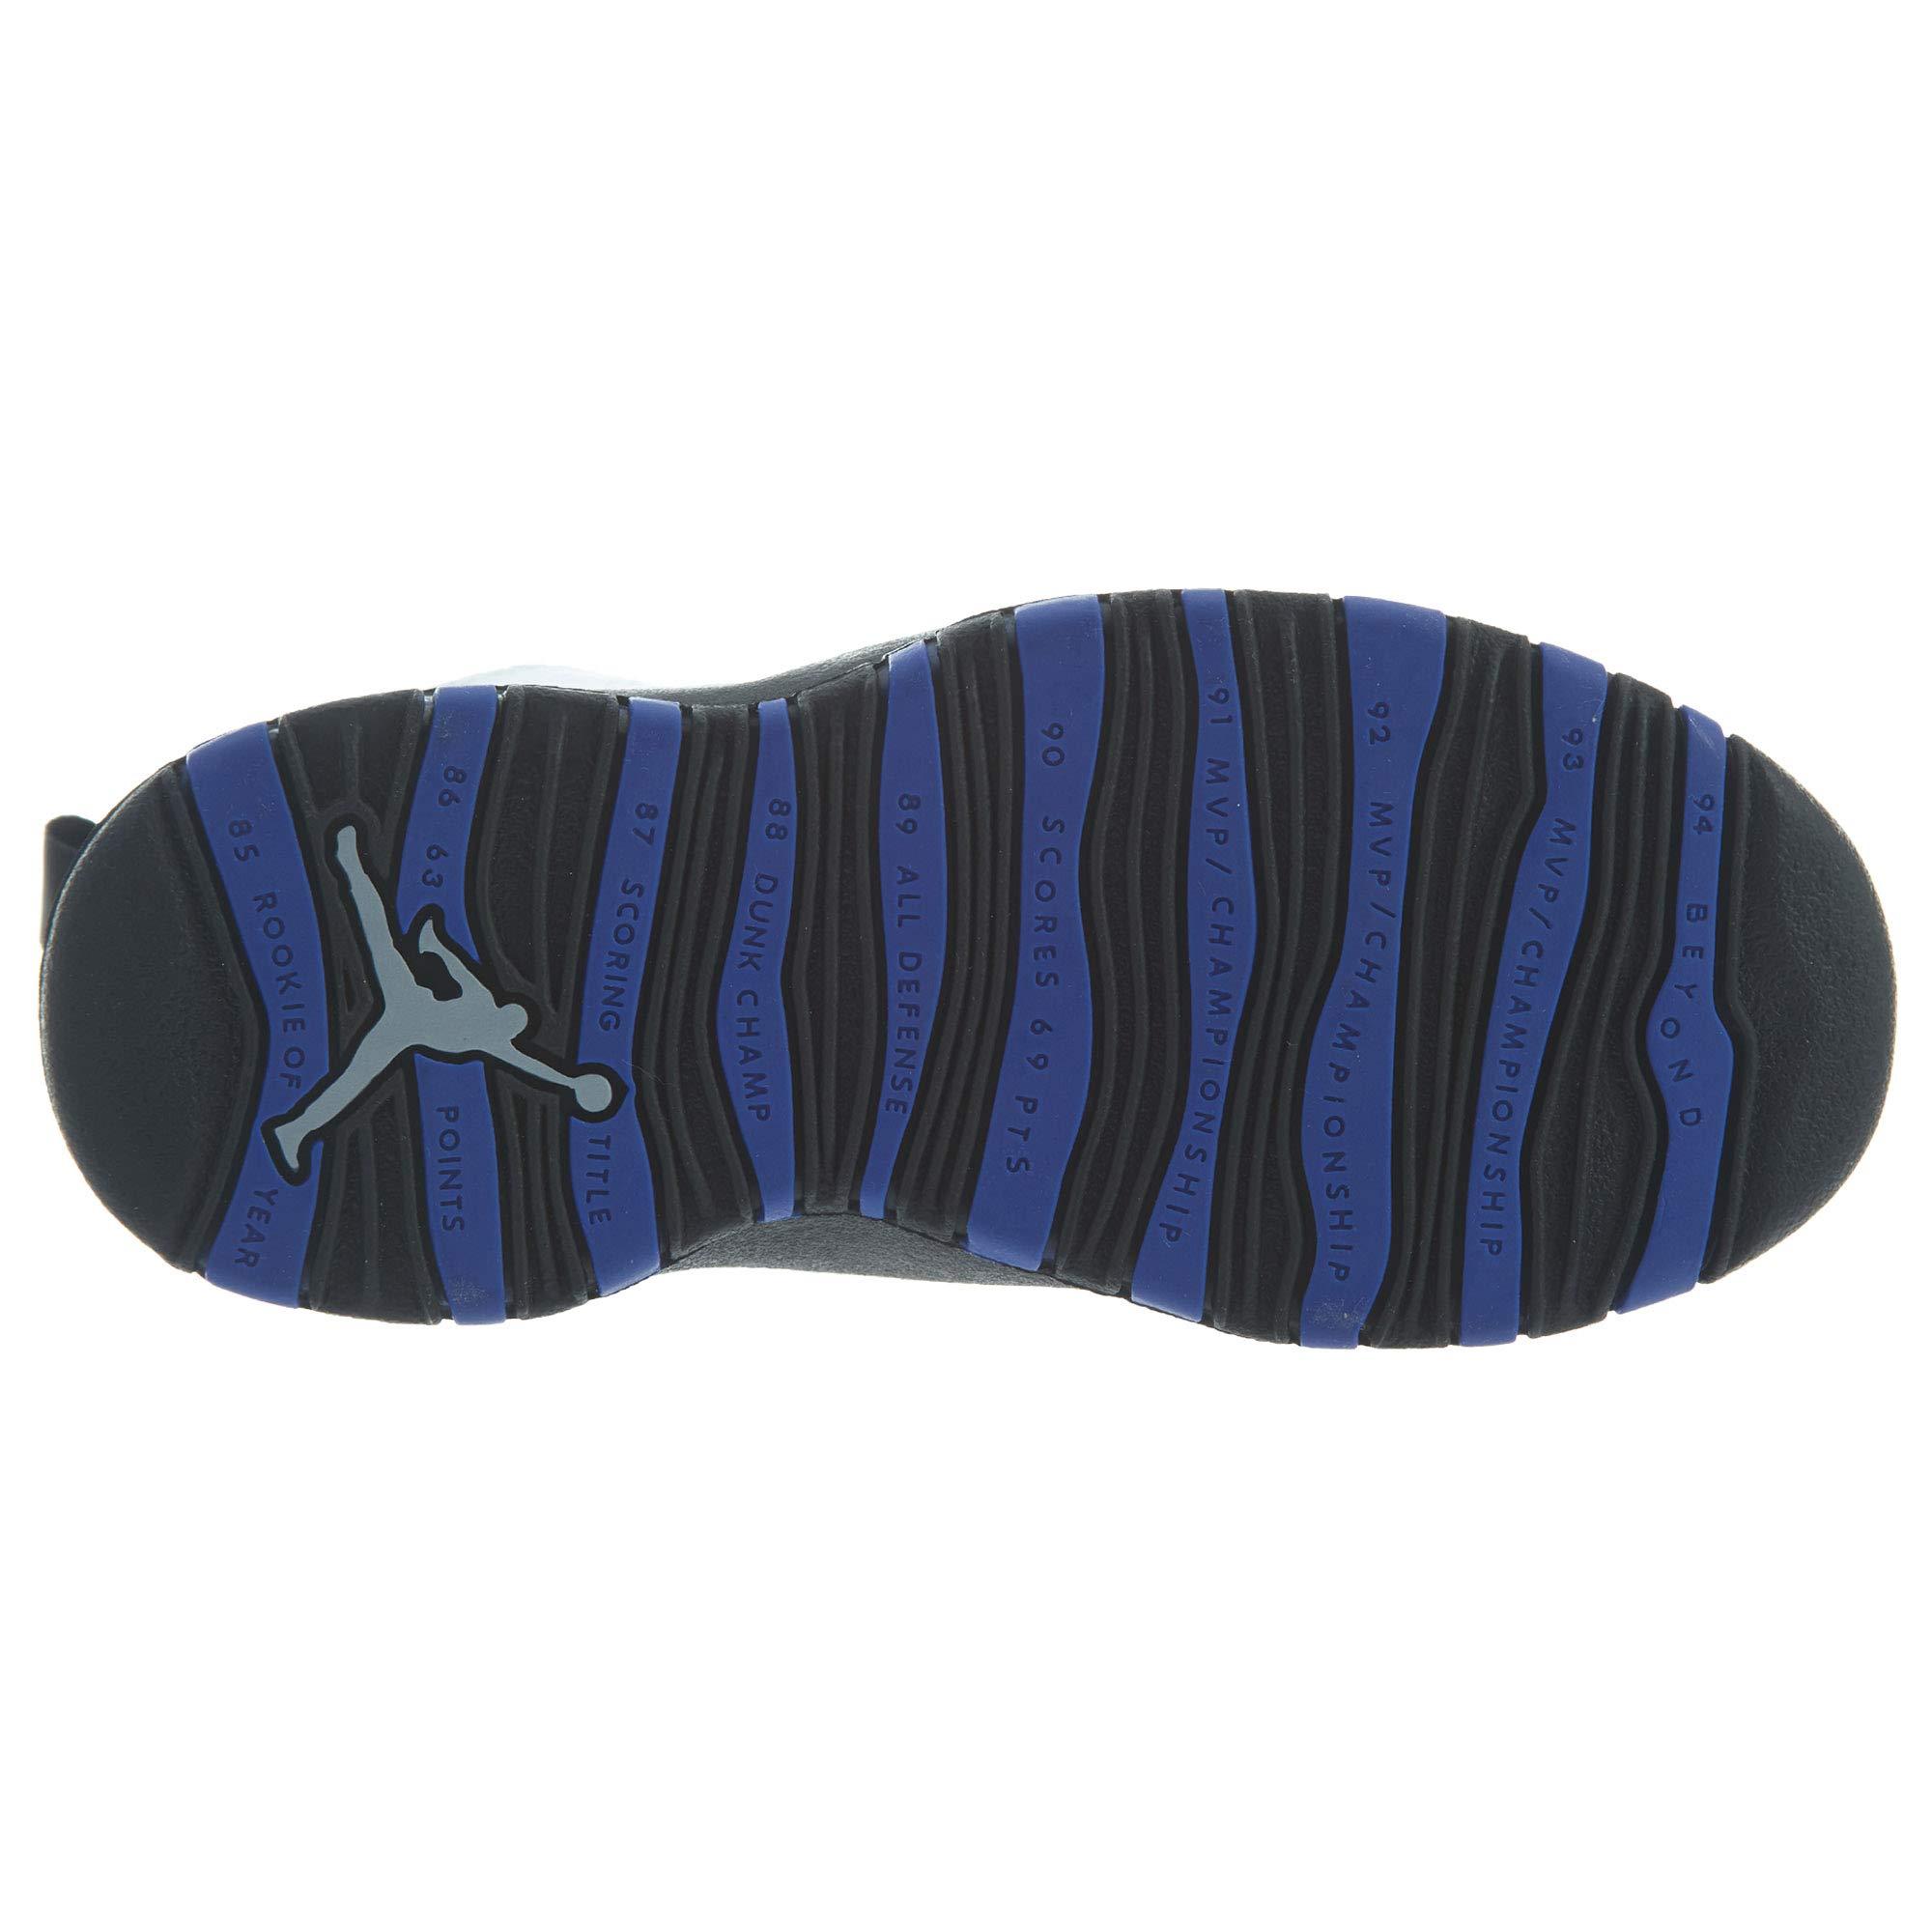 Jordan Air Retro 10''Orlando White/Black-Royal Blue (PS) (13 M US Little Kid) by Jordan (Image #7)